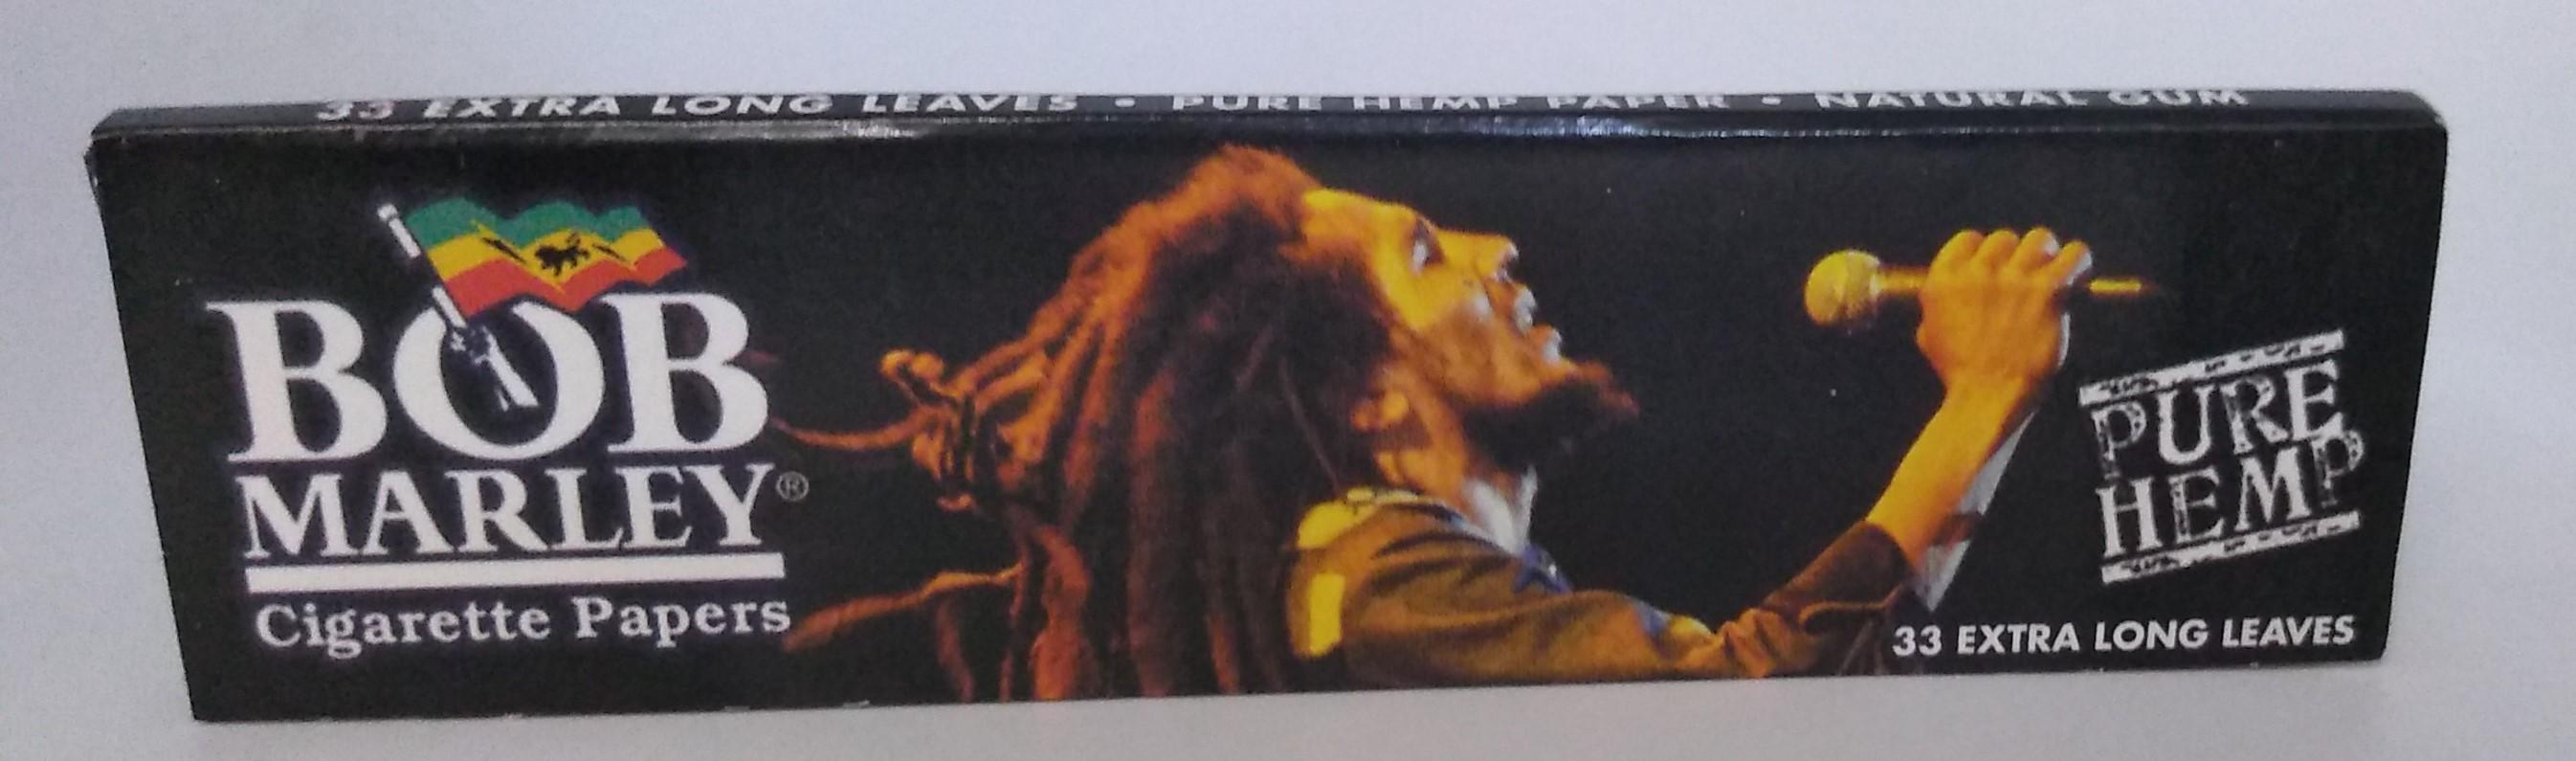 Papel Bob Marley King Size